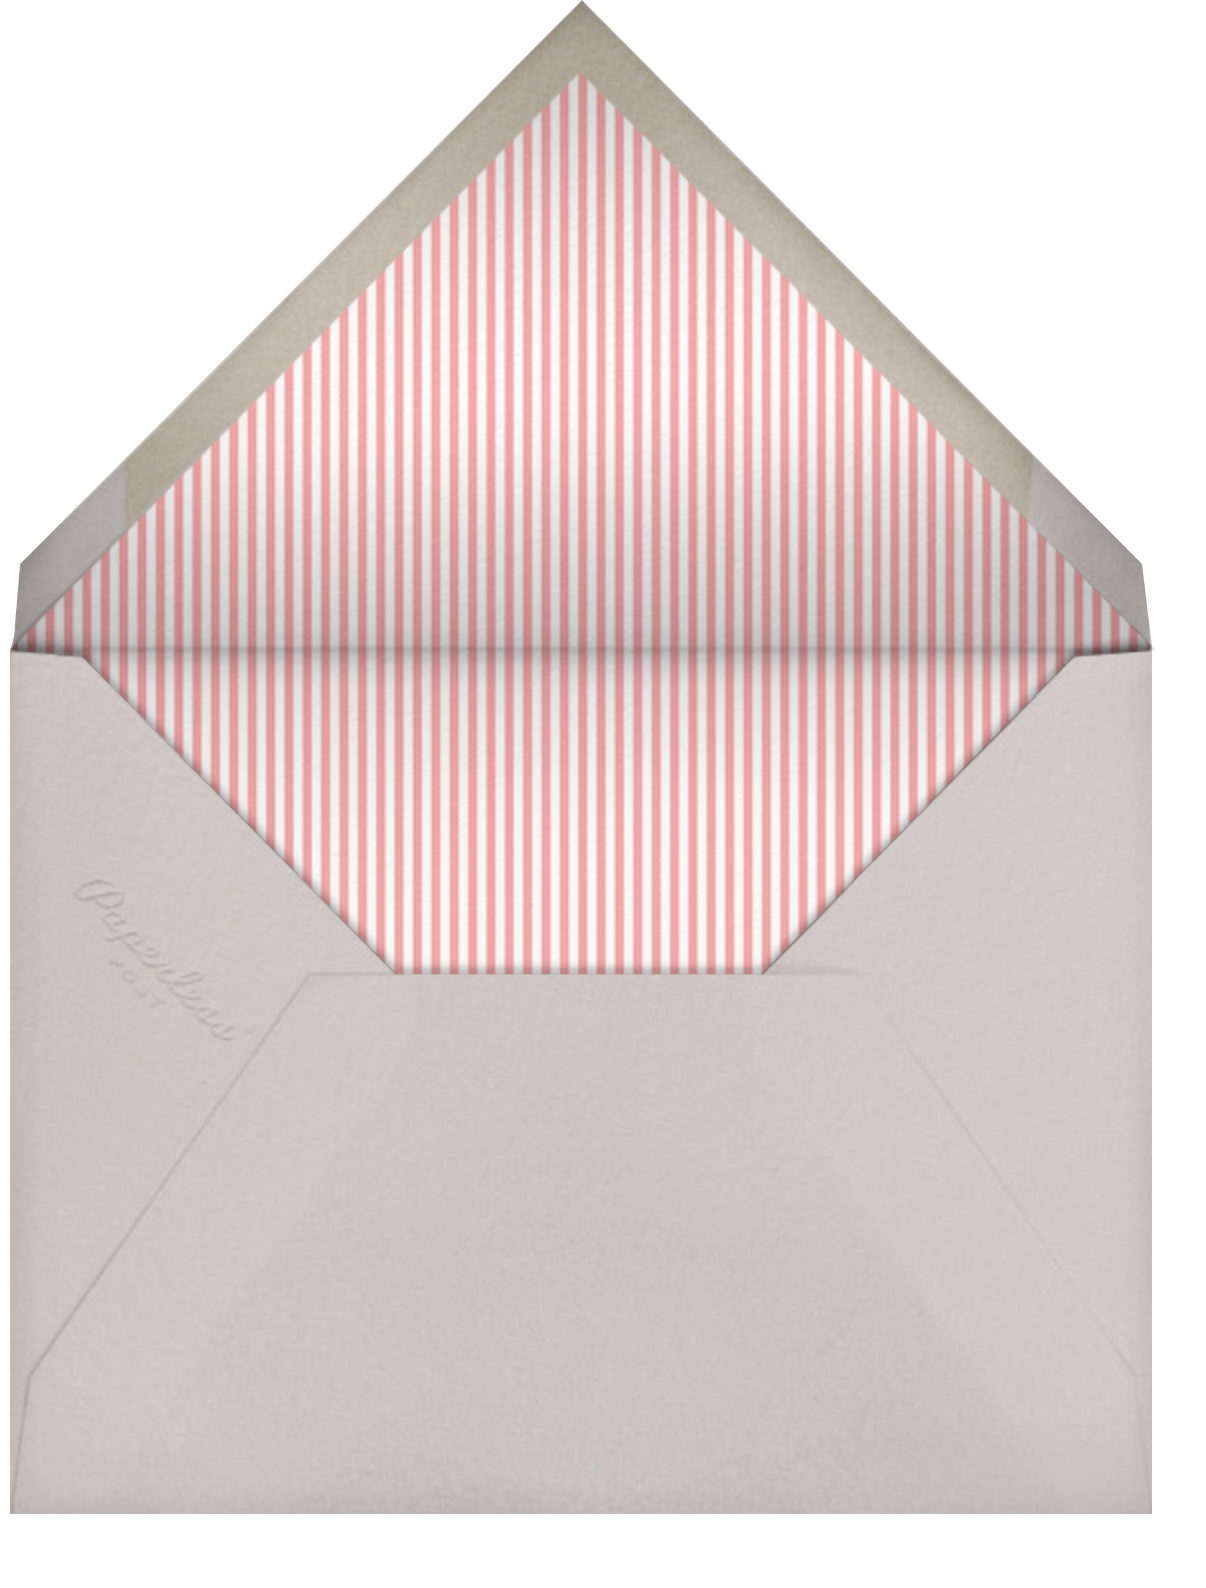 Little Heart Halo (Stationery) - Gold - Little Cube - Kids' stationery - envelope back